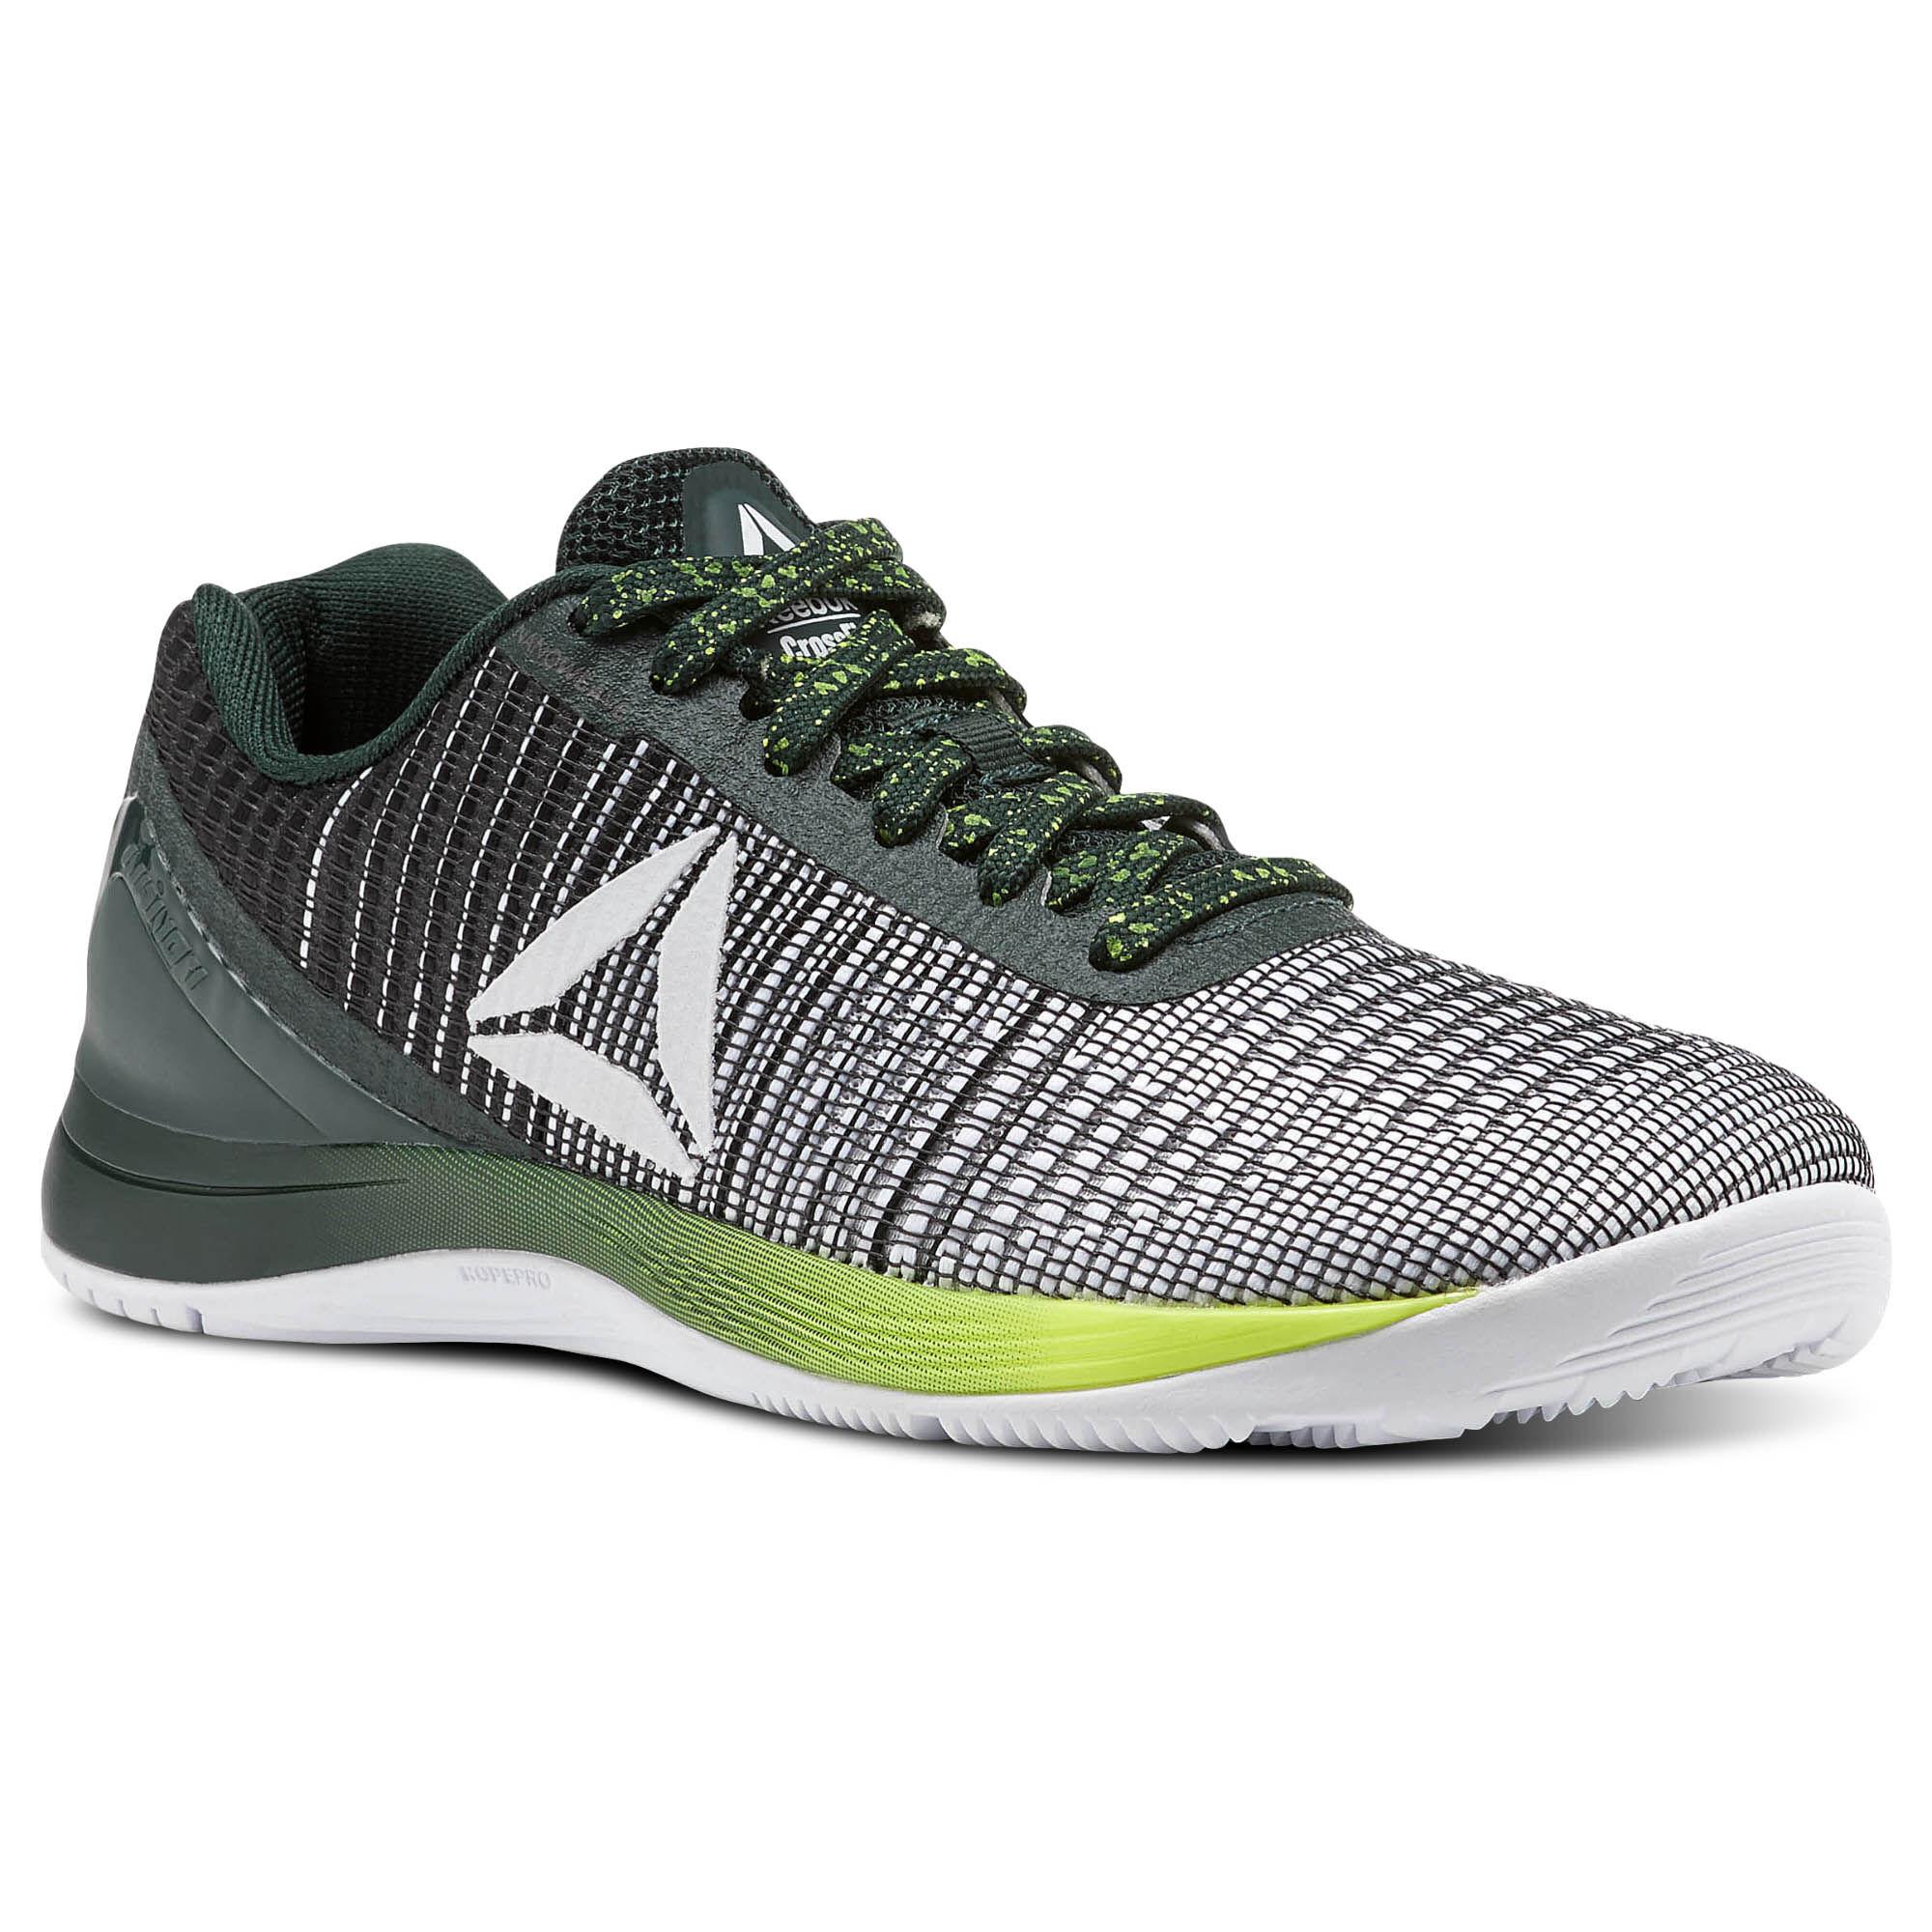 Reebok Training Shoes Cross Fit Nano 7 Weave Neon Pack For Women Black/White/Grey/Yellow CM9520